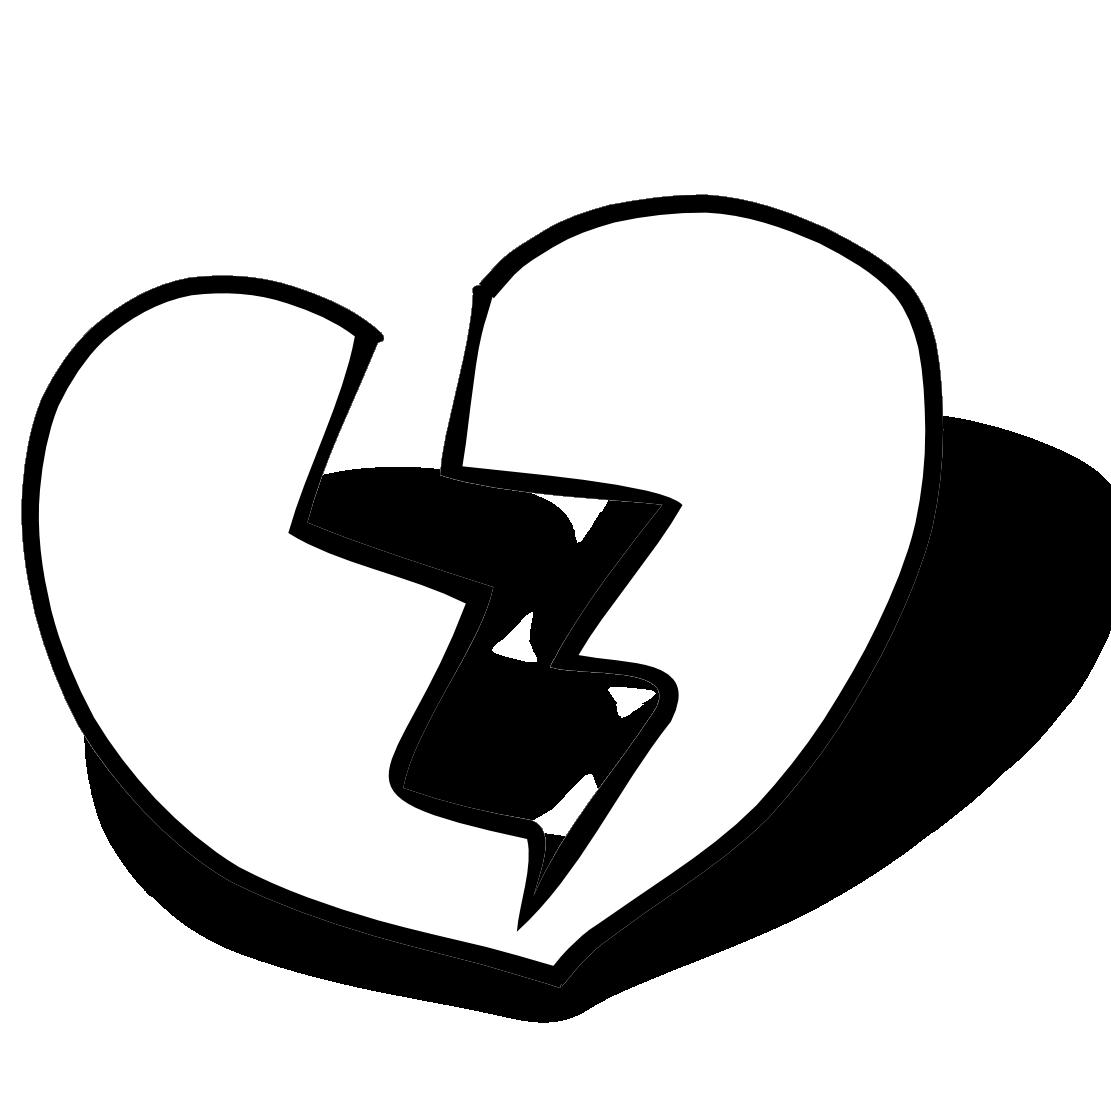 Free Broken Heart Graphics, Download Free Clip Art, Free Clip Art on ... jpg library stock